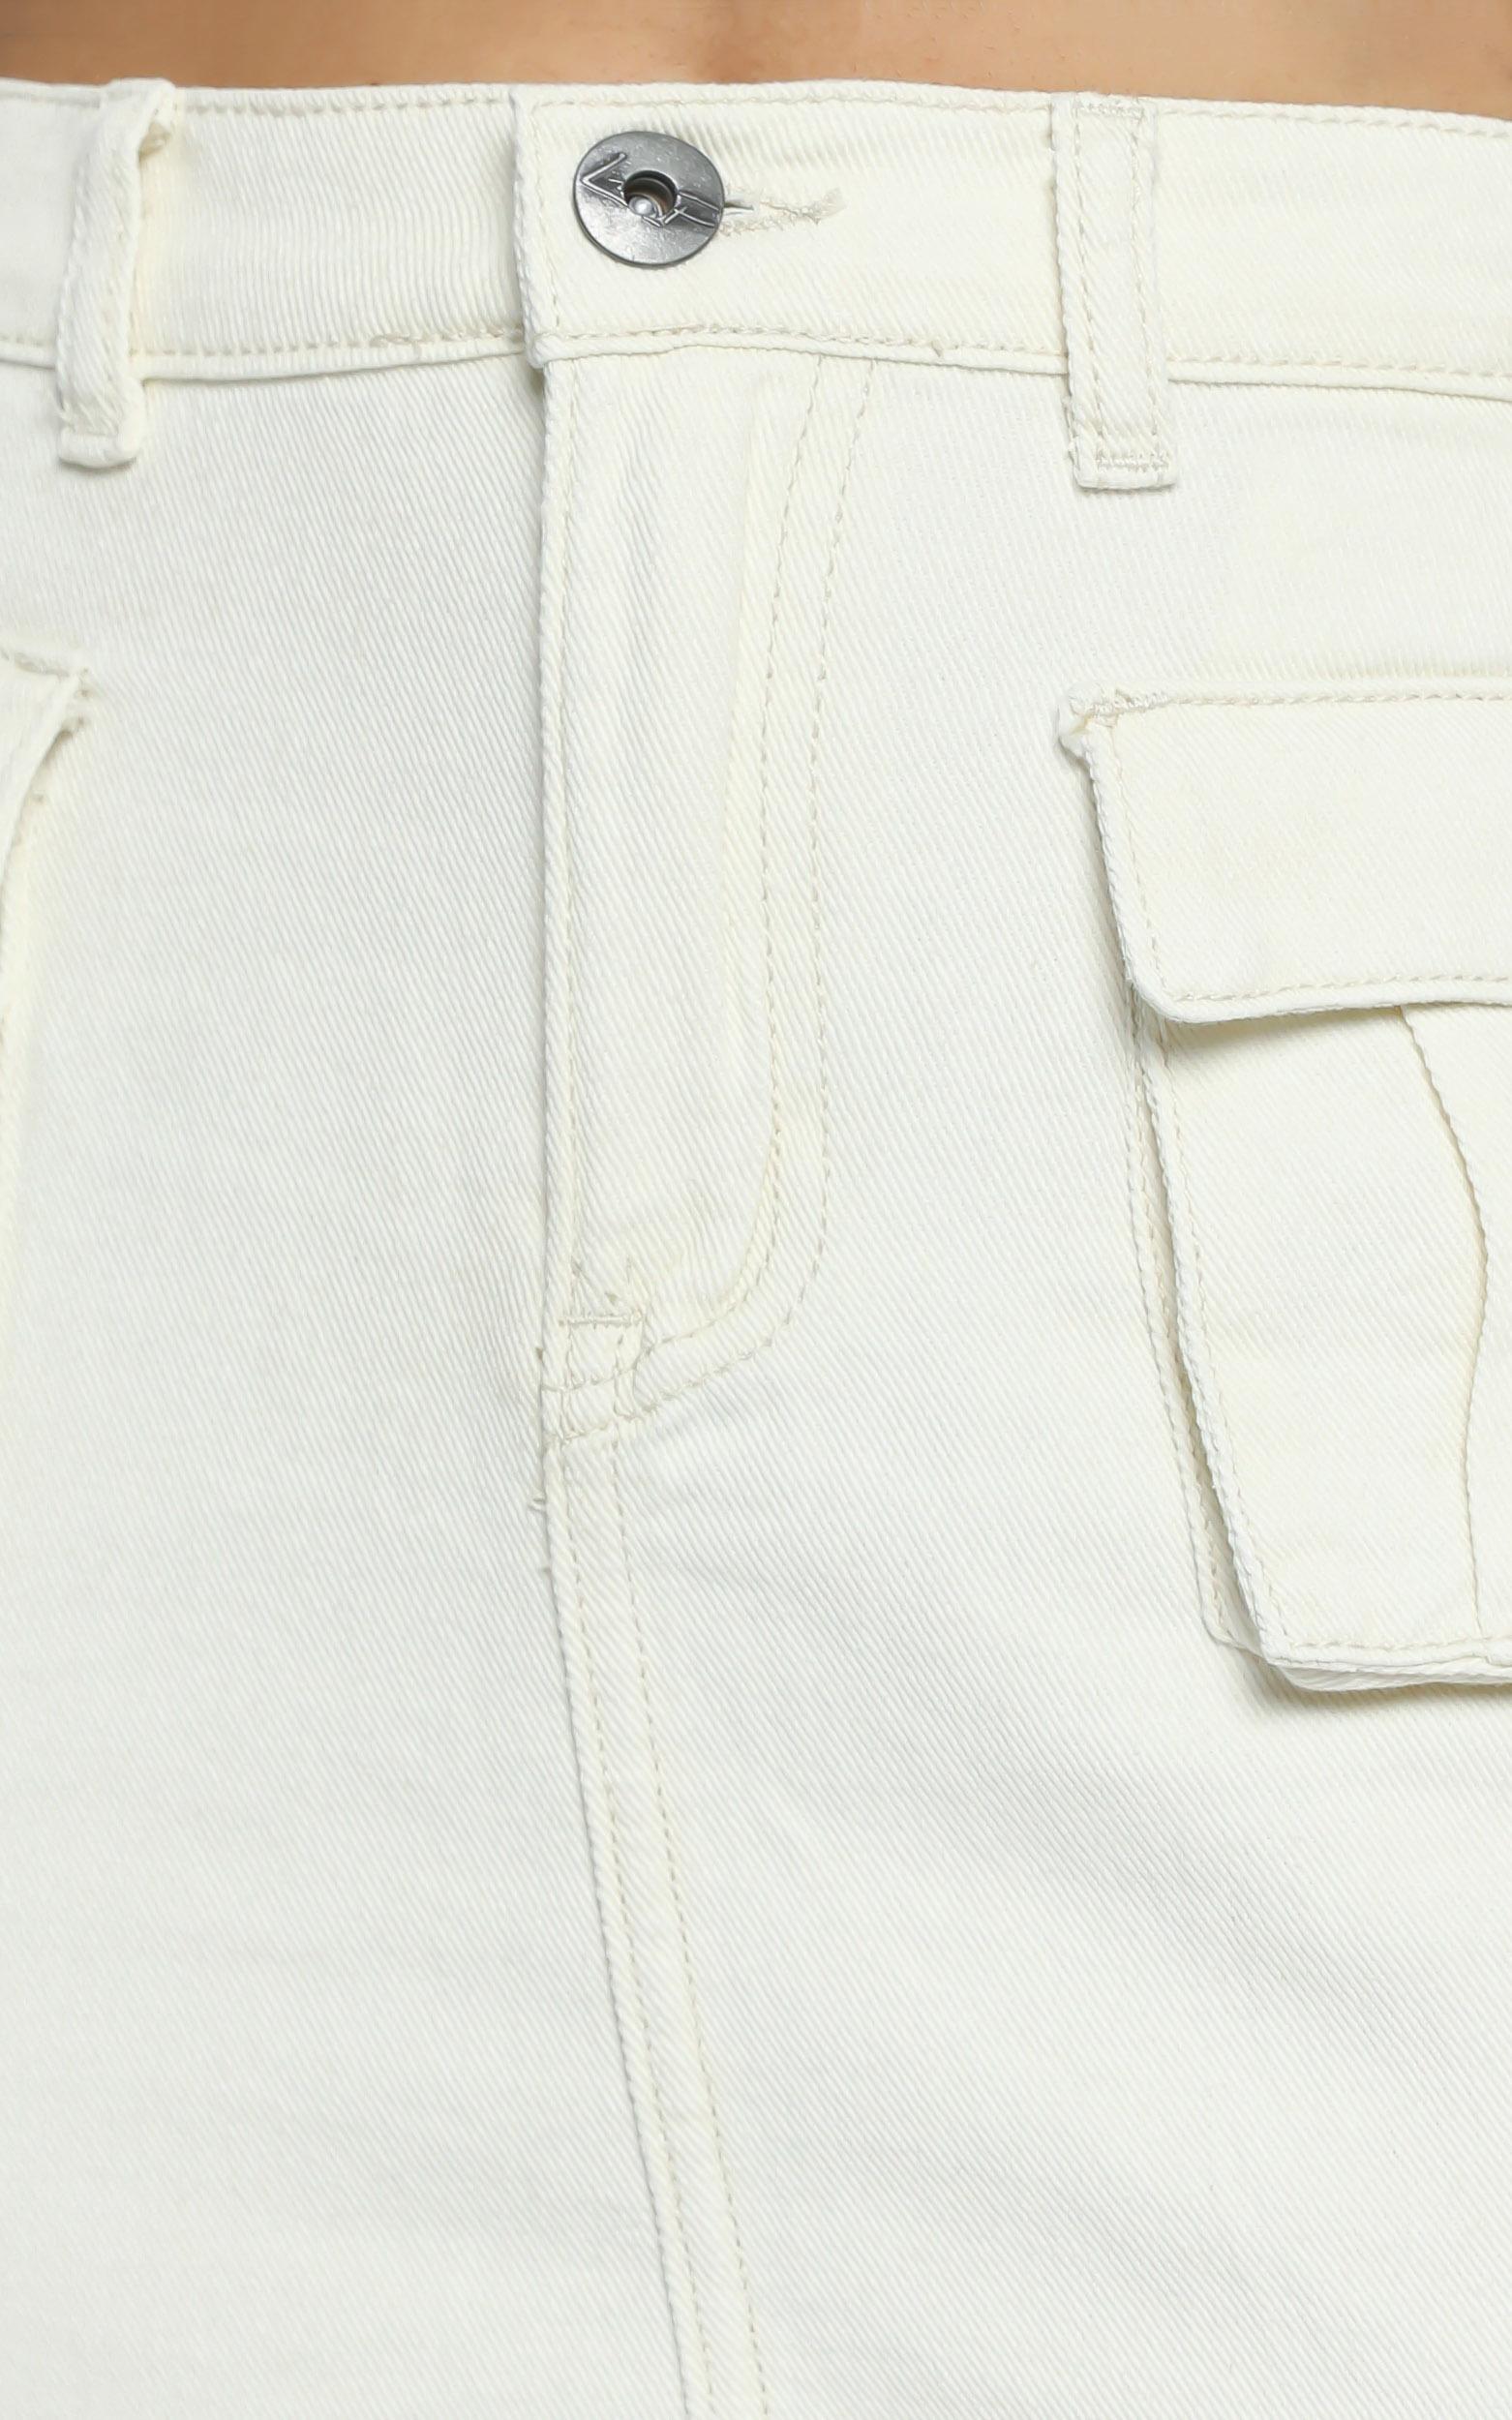 Mendez Skirt in Ecru - 6 (XS), Cream, hi-res image number null